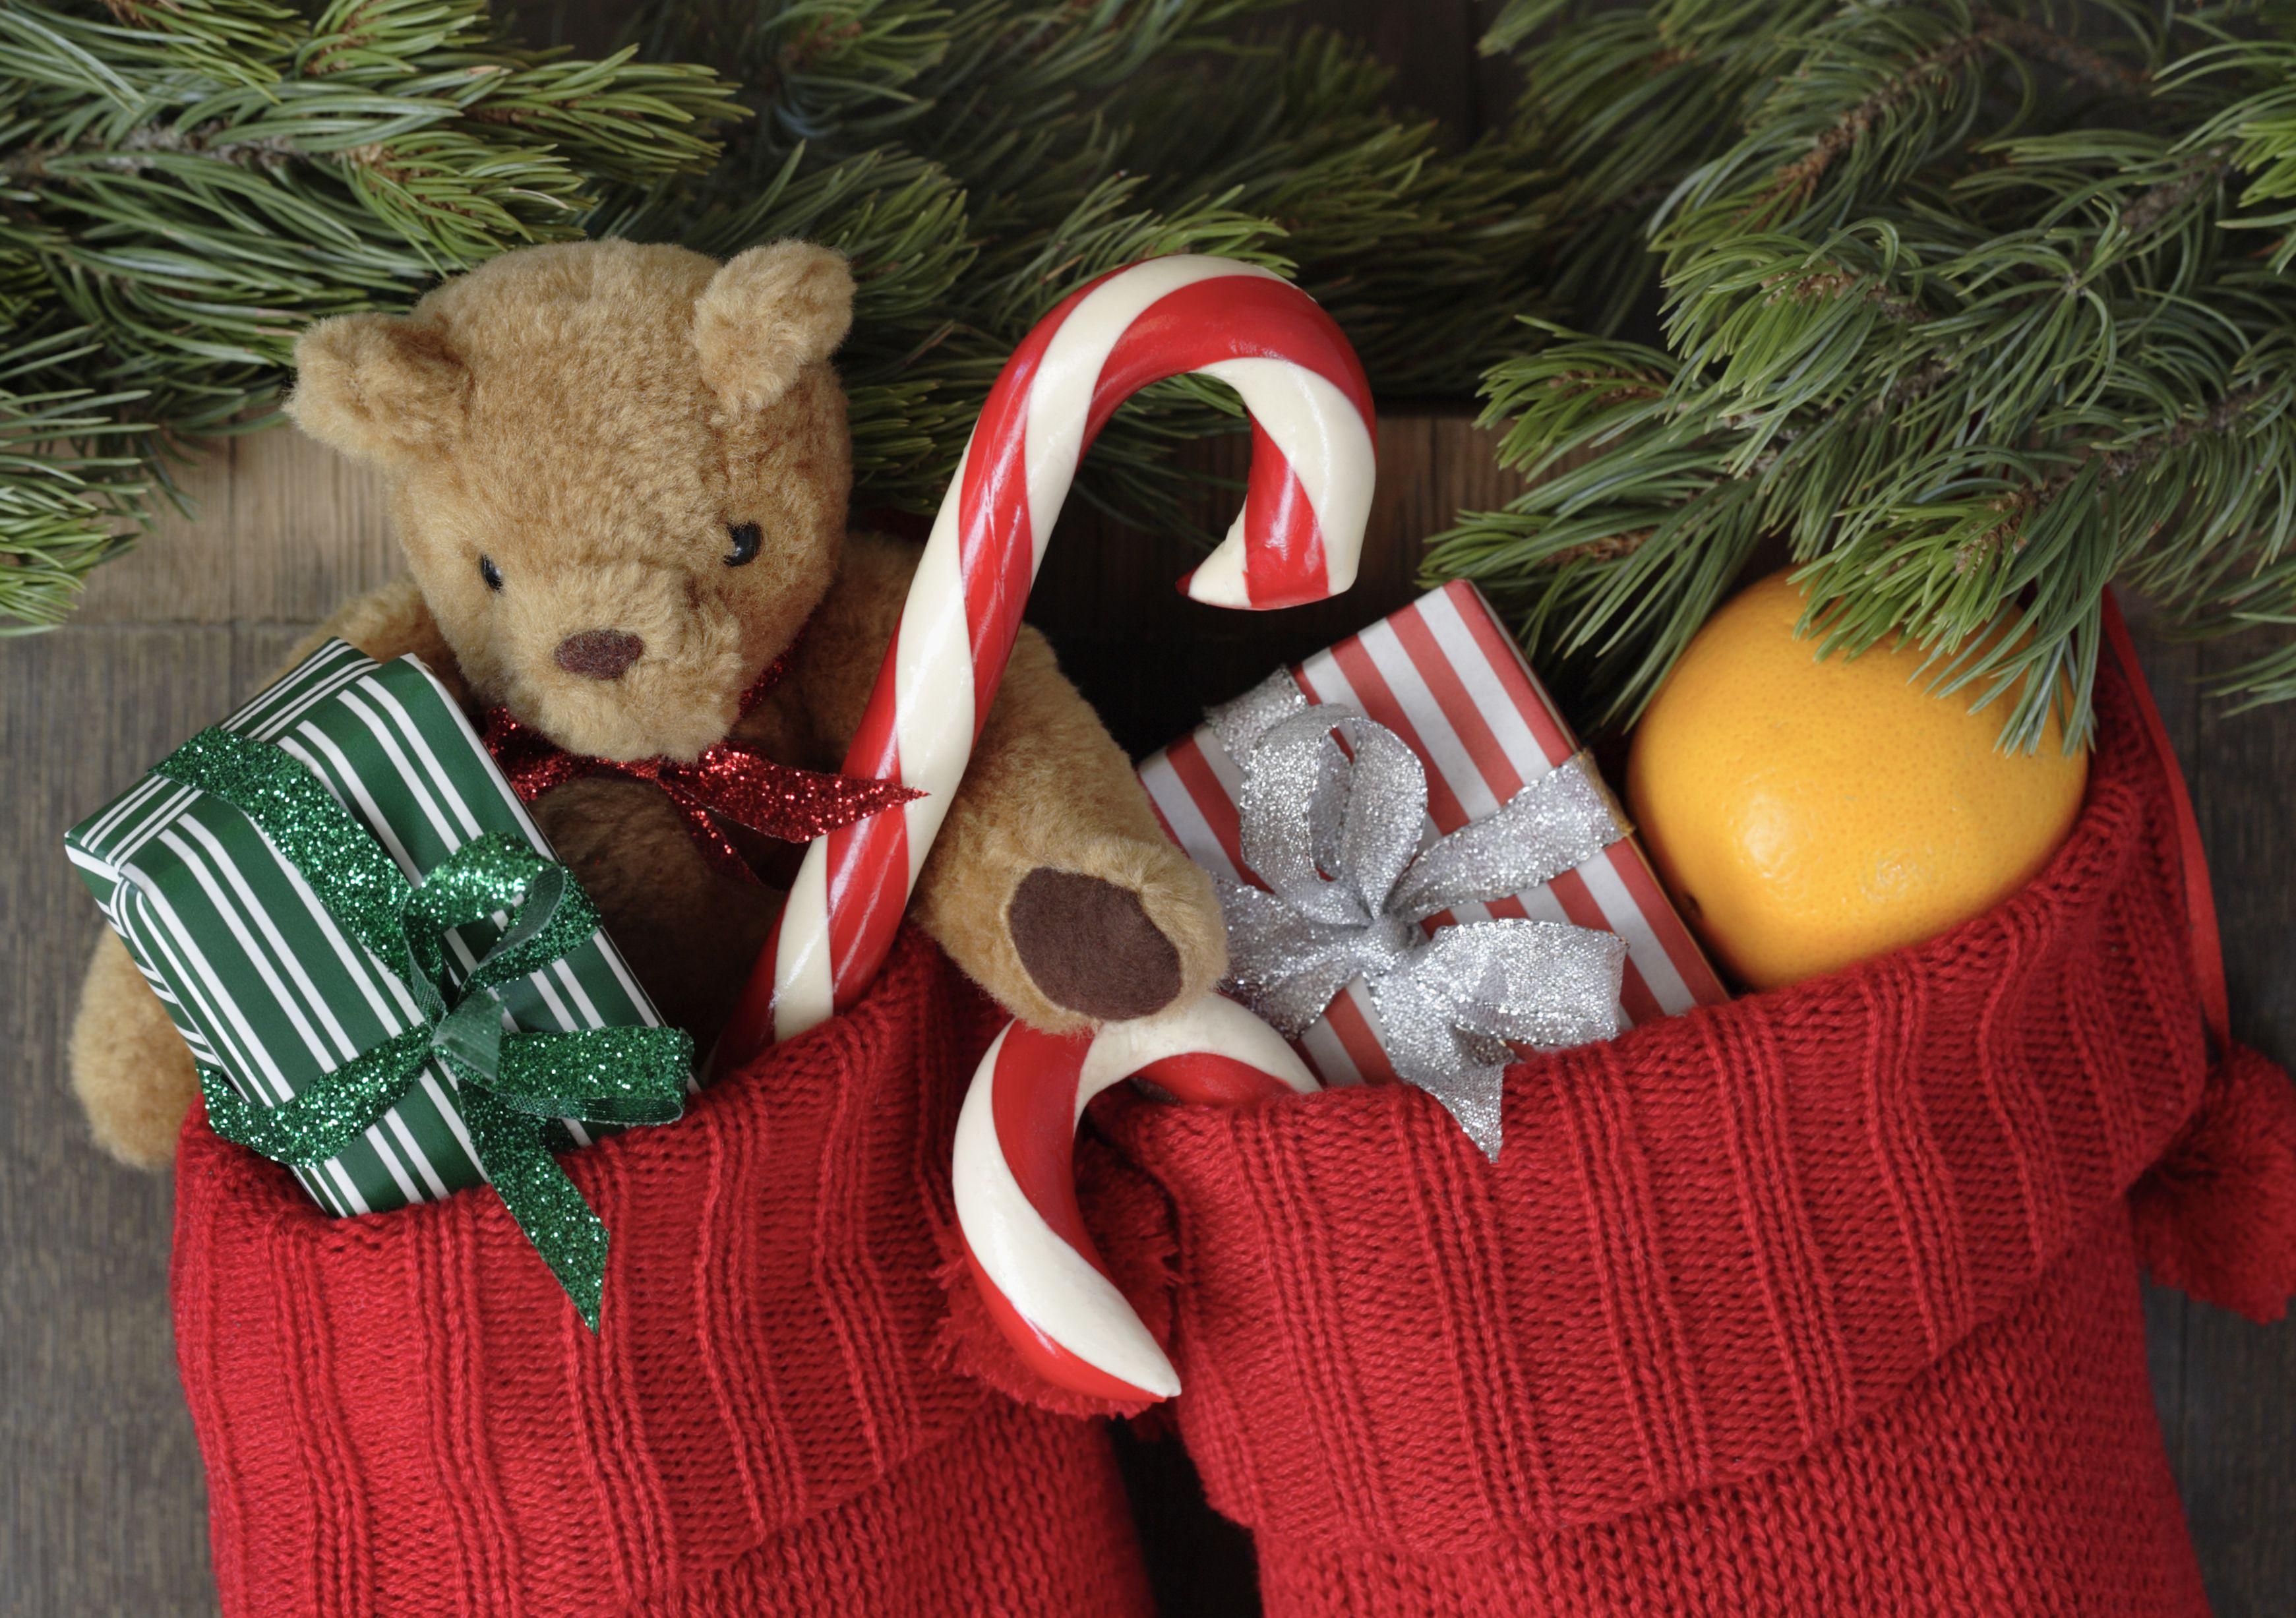 Lummy Stockings History Reason We Leave Oranges Oranges Asstocking Stuffers Reason We Leave Oranges Stockings History Of inspiration Christmas Sock Exchange